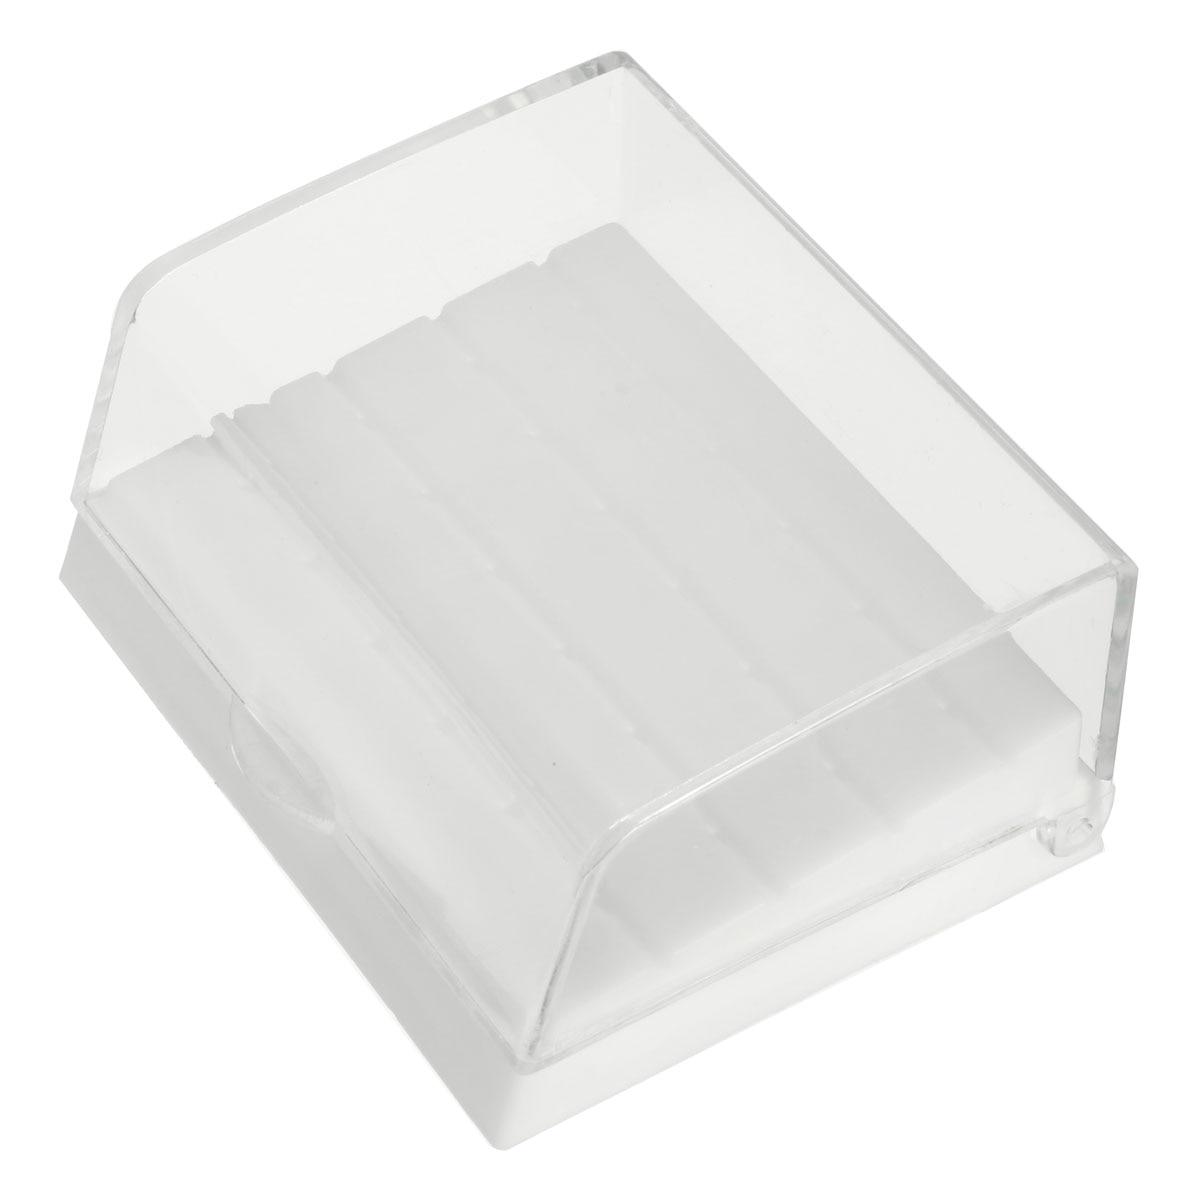 24 Holes Plastic Dental Bur Holder Disinfection Carbide Burs Block Drills Case Box Dentist Products Lab Equipment Rndom Color